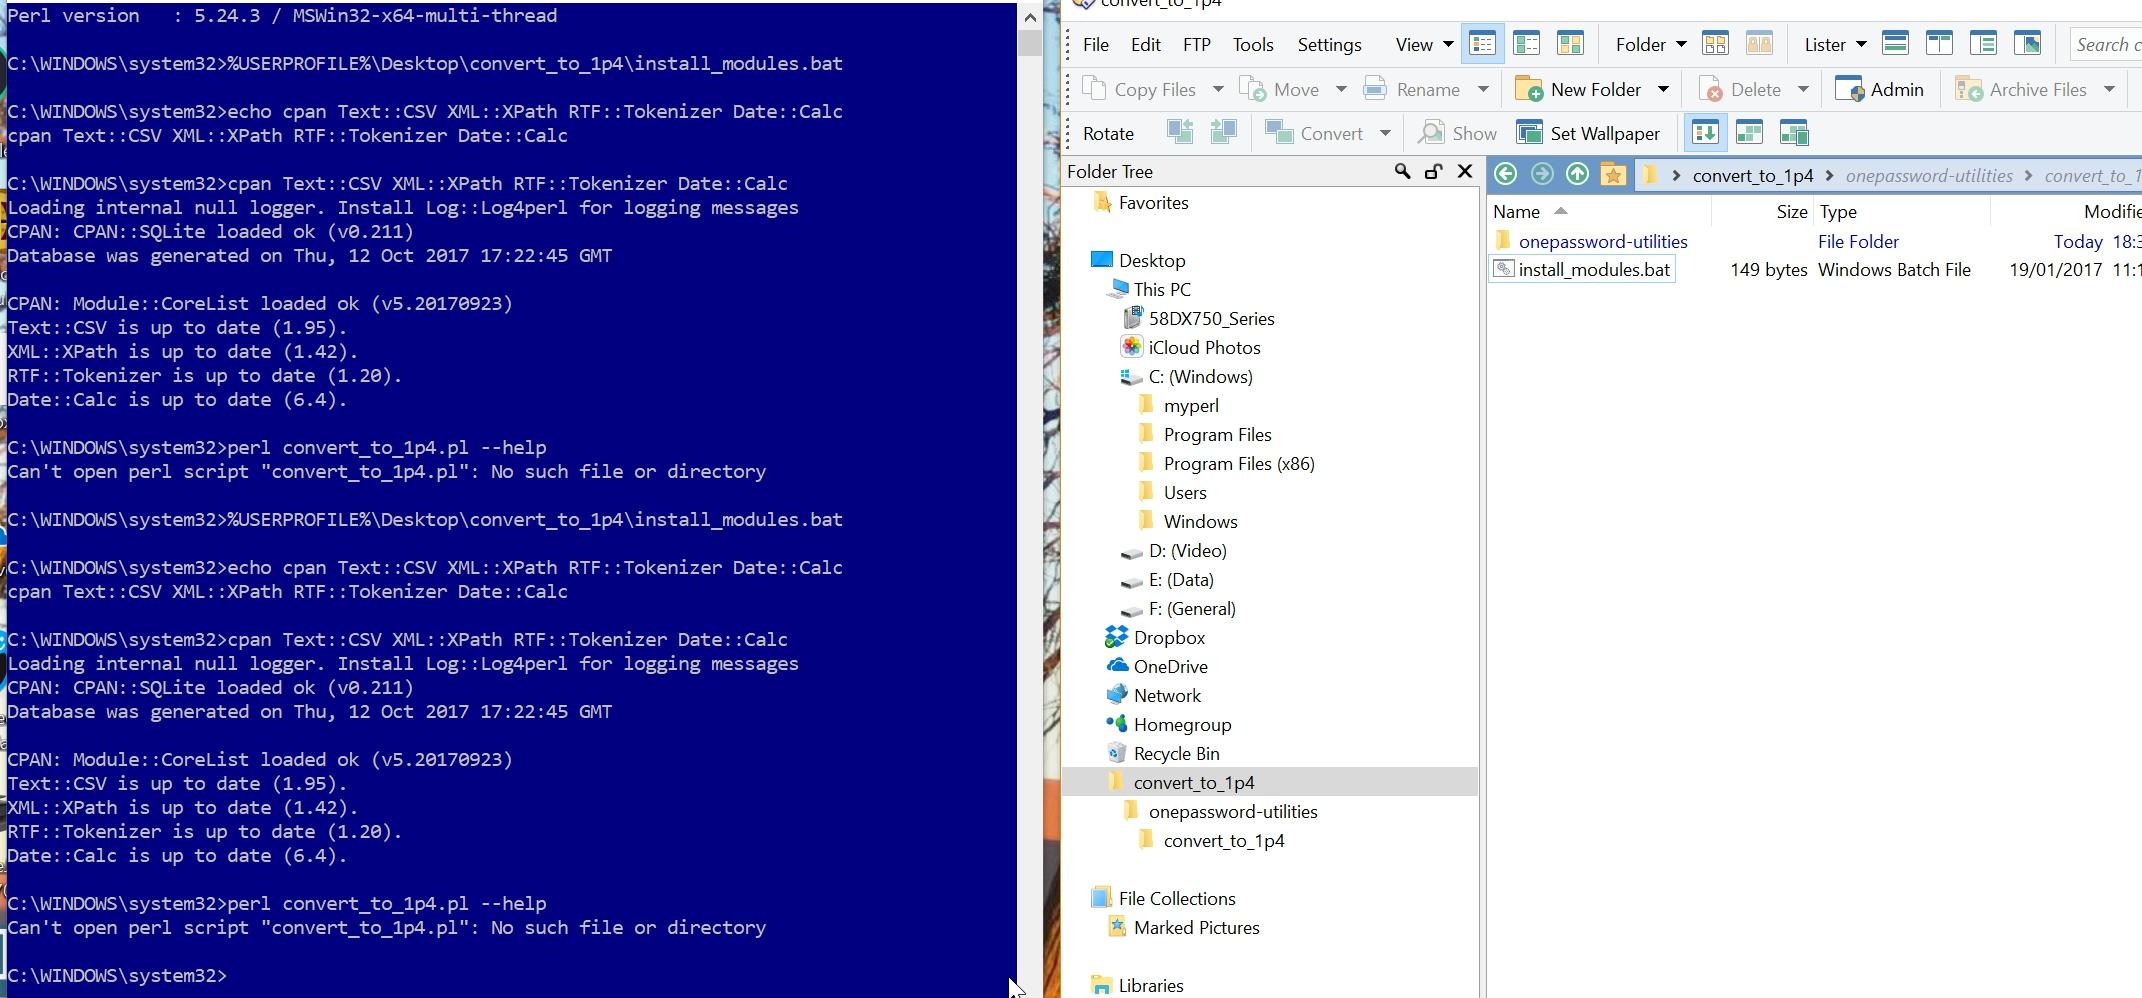 MrC's Convert to 1Password Utility (mrc-converter-suite) - Page 36